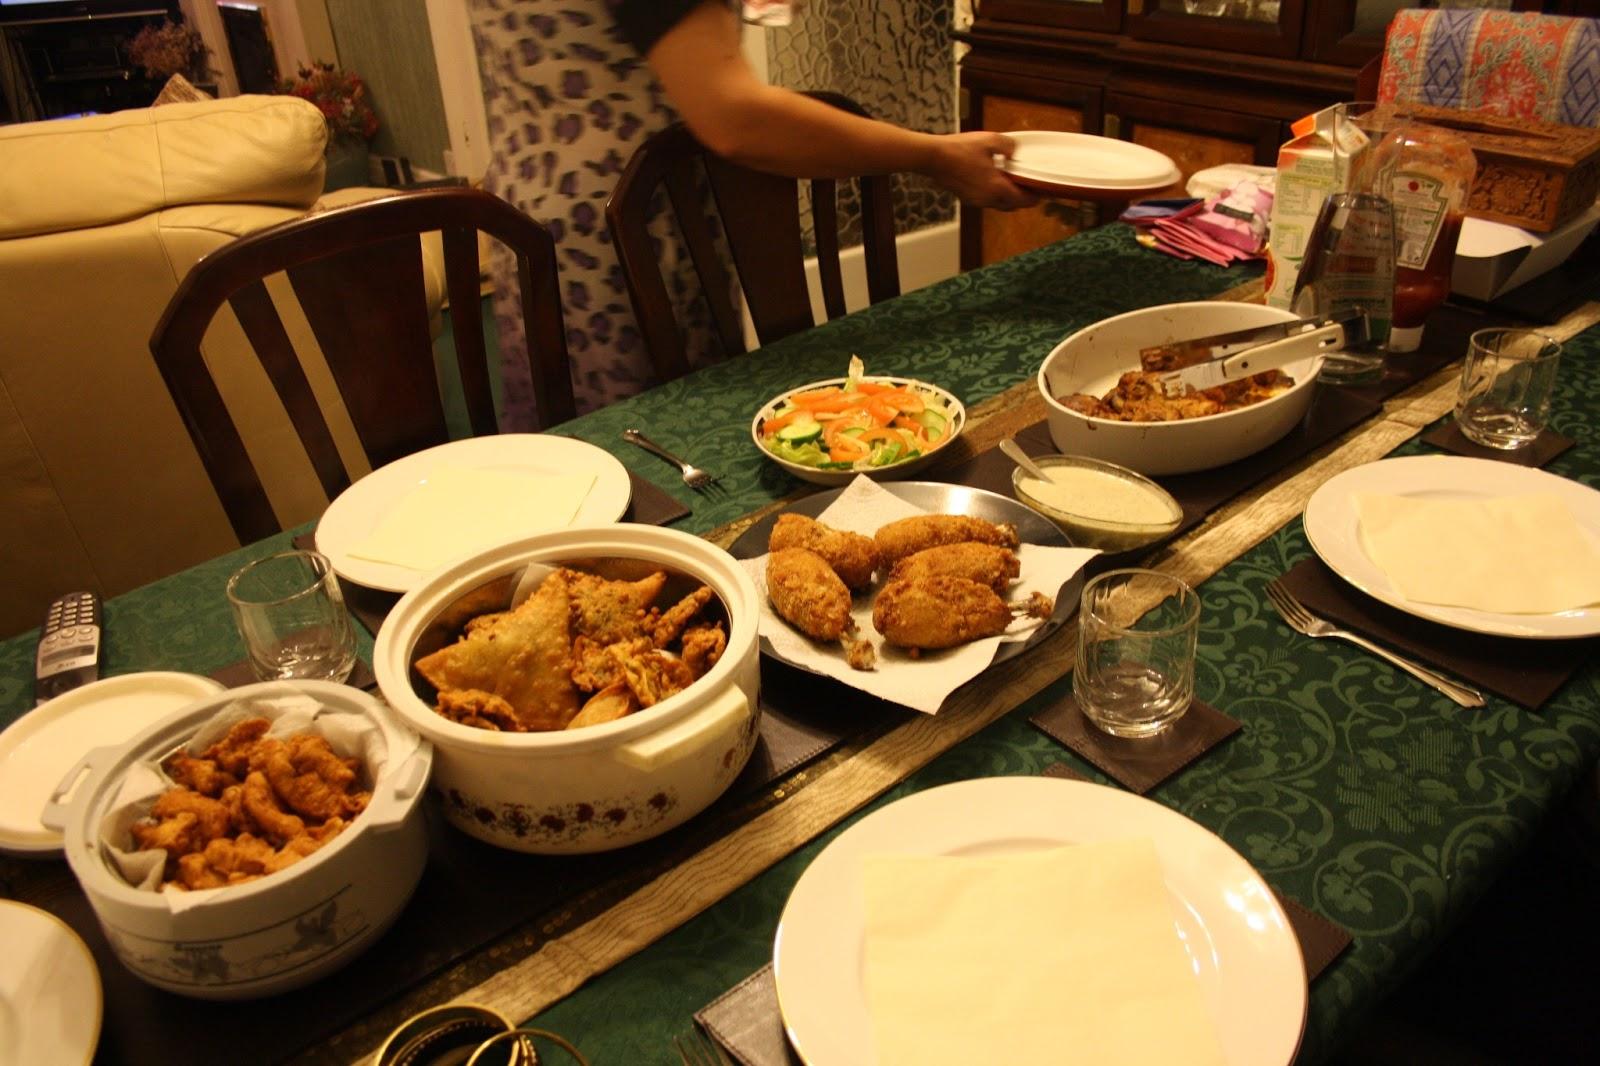 Gut Health during Ramadan